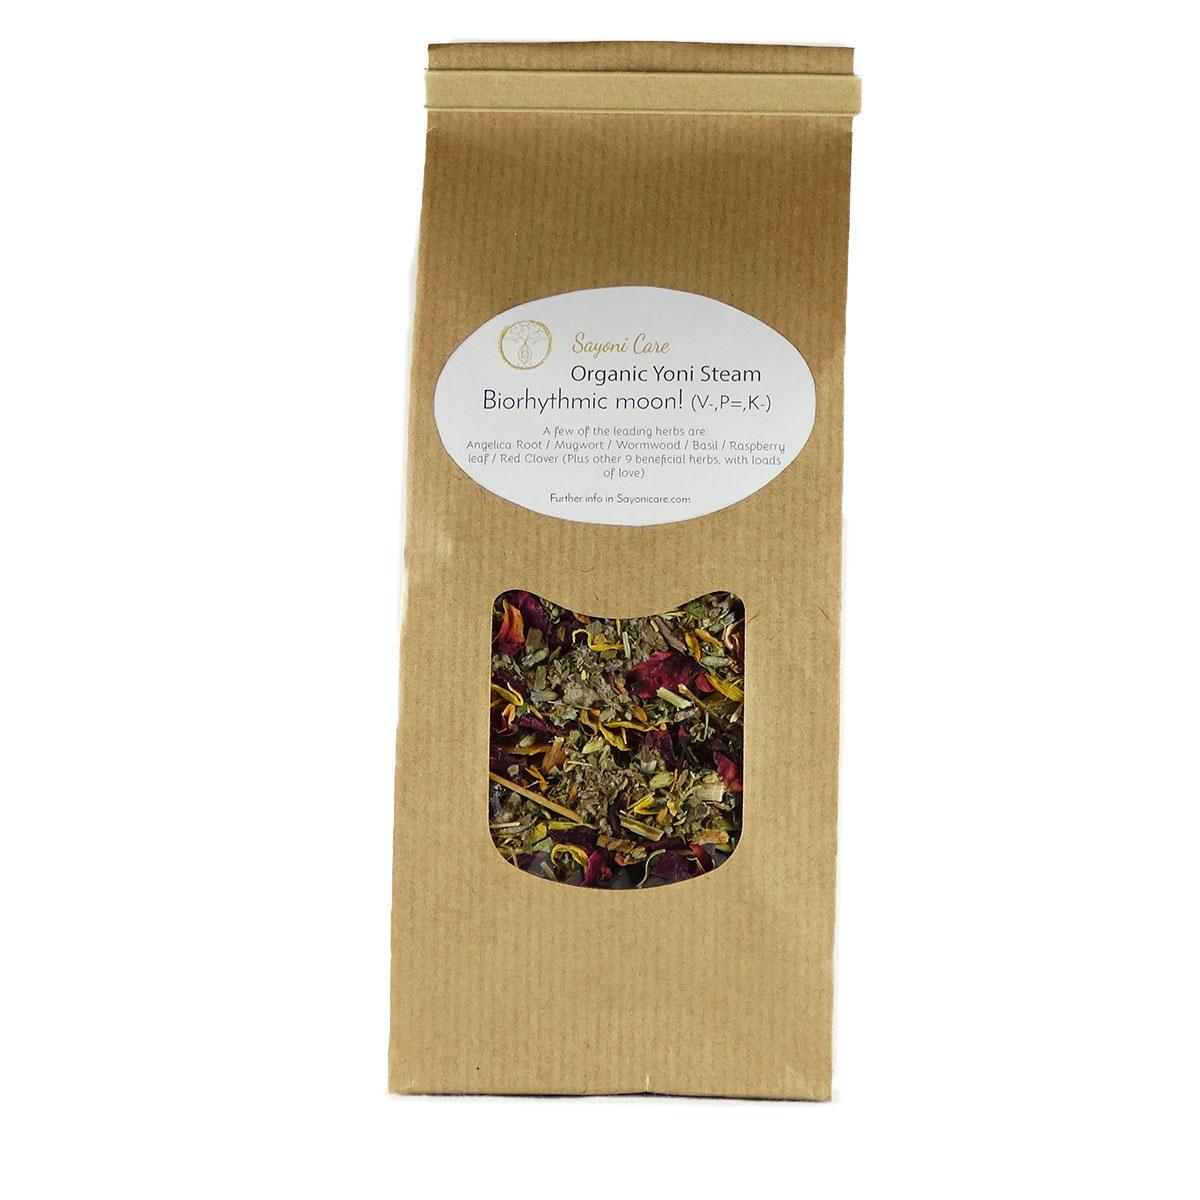 Biorhythmic moon organic herbal vaginal steam - Sayoni Care